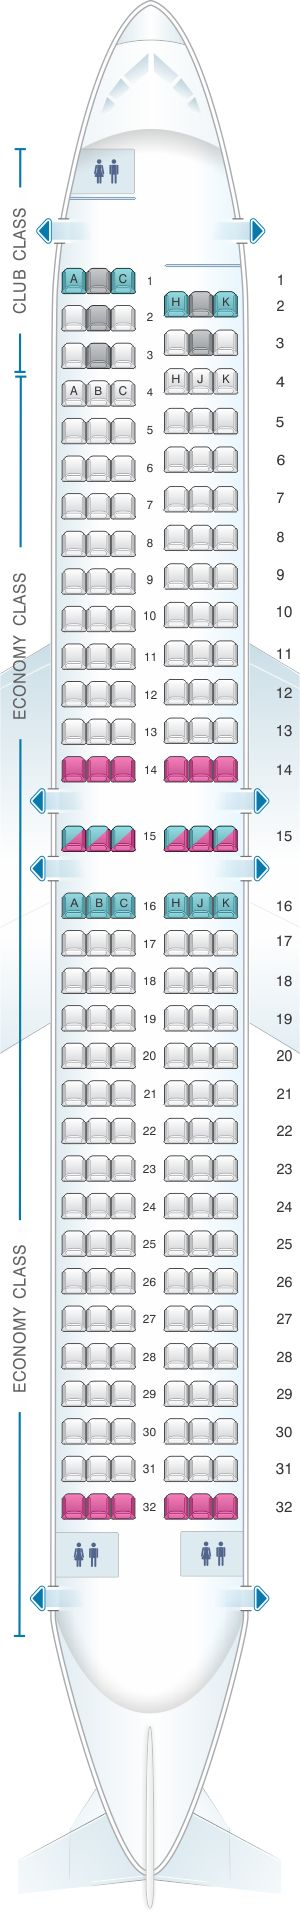 Seat Map Air Transat Boeing 737-800 Canada